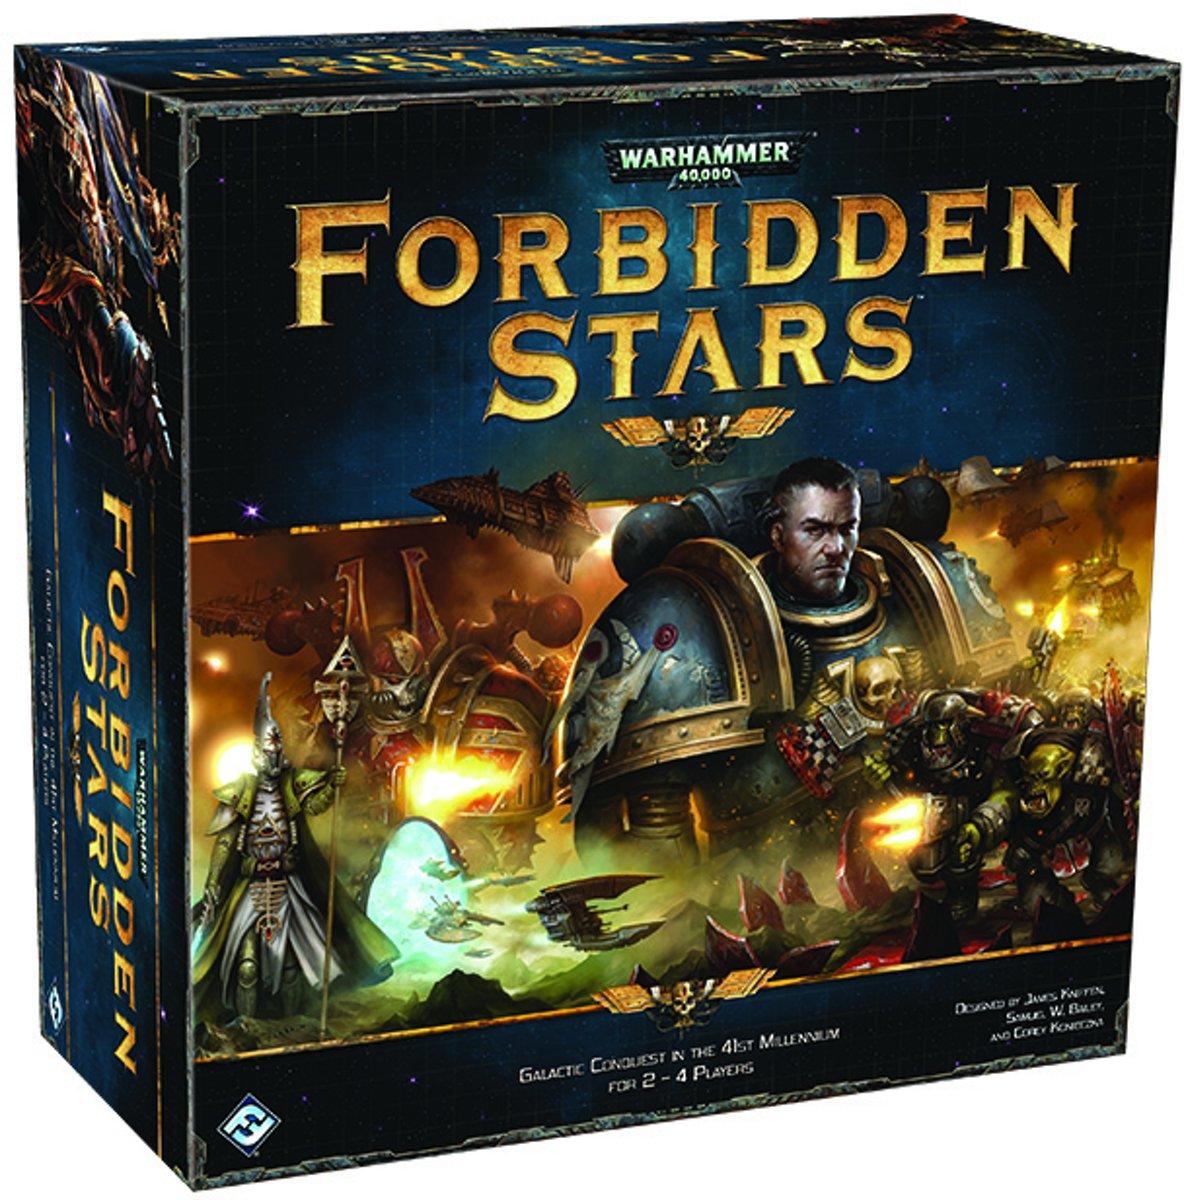 Warhammer 40K Forbidden Stars board game